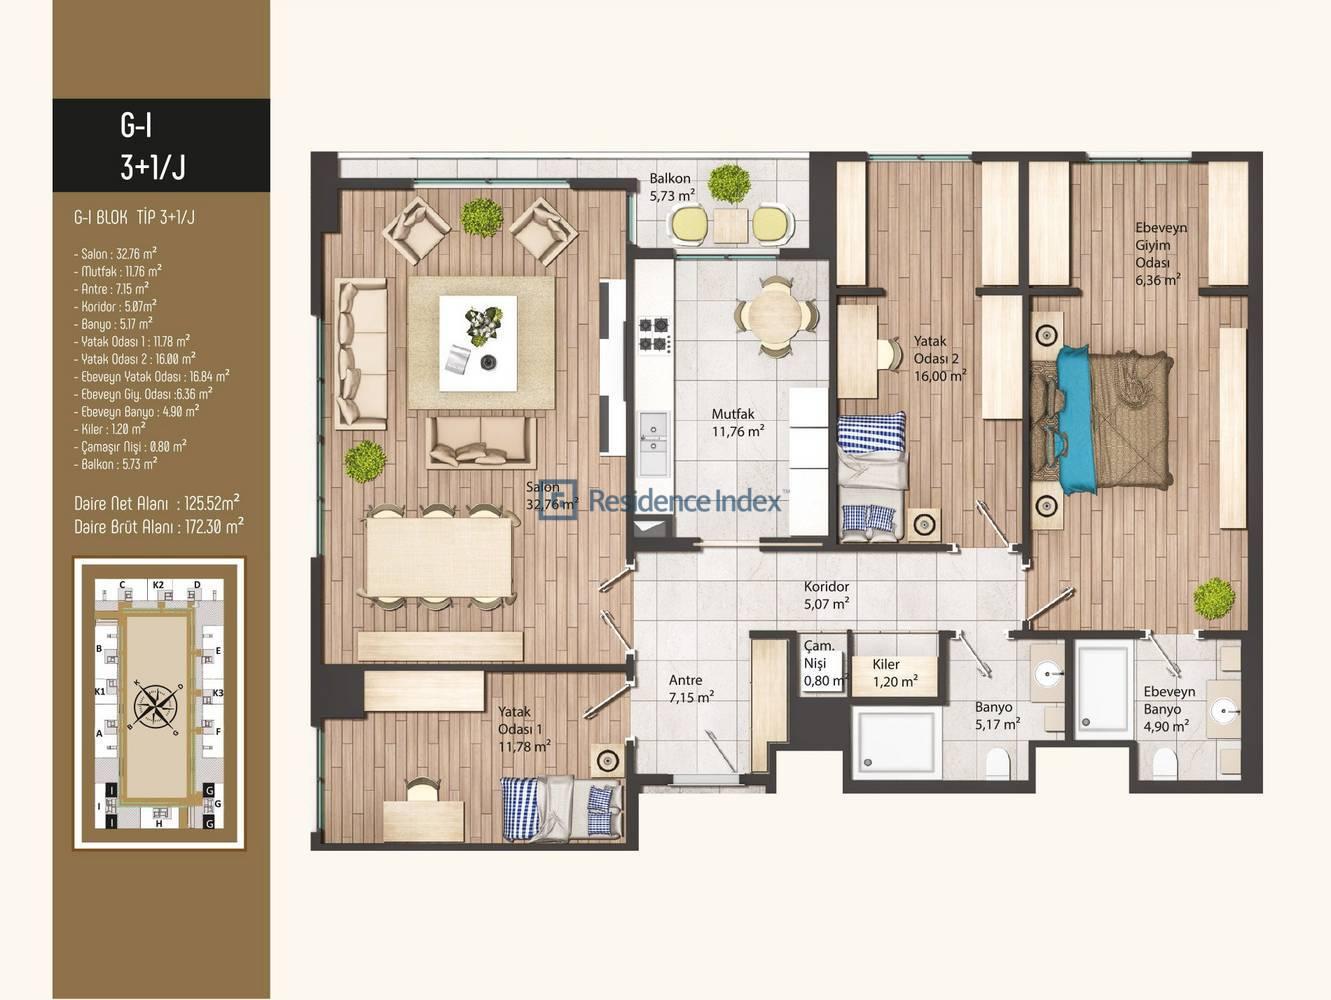 Kameroğlu Metrohome Residence 3+1 J